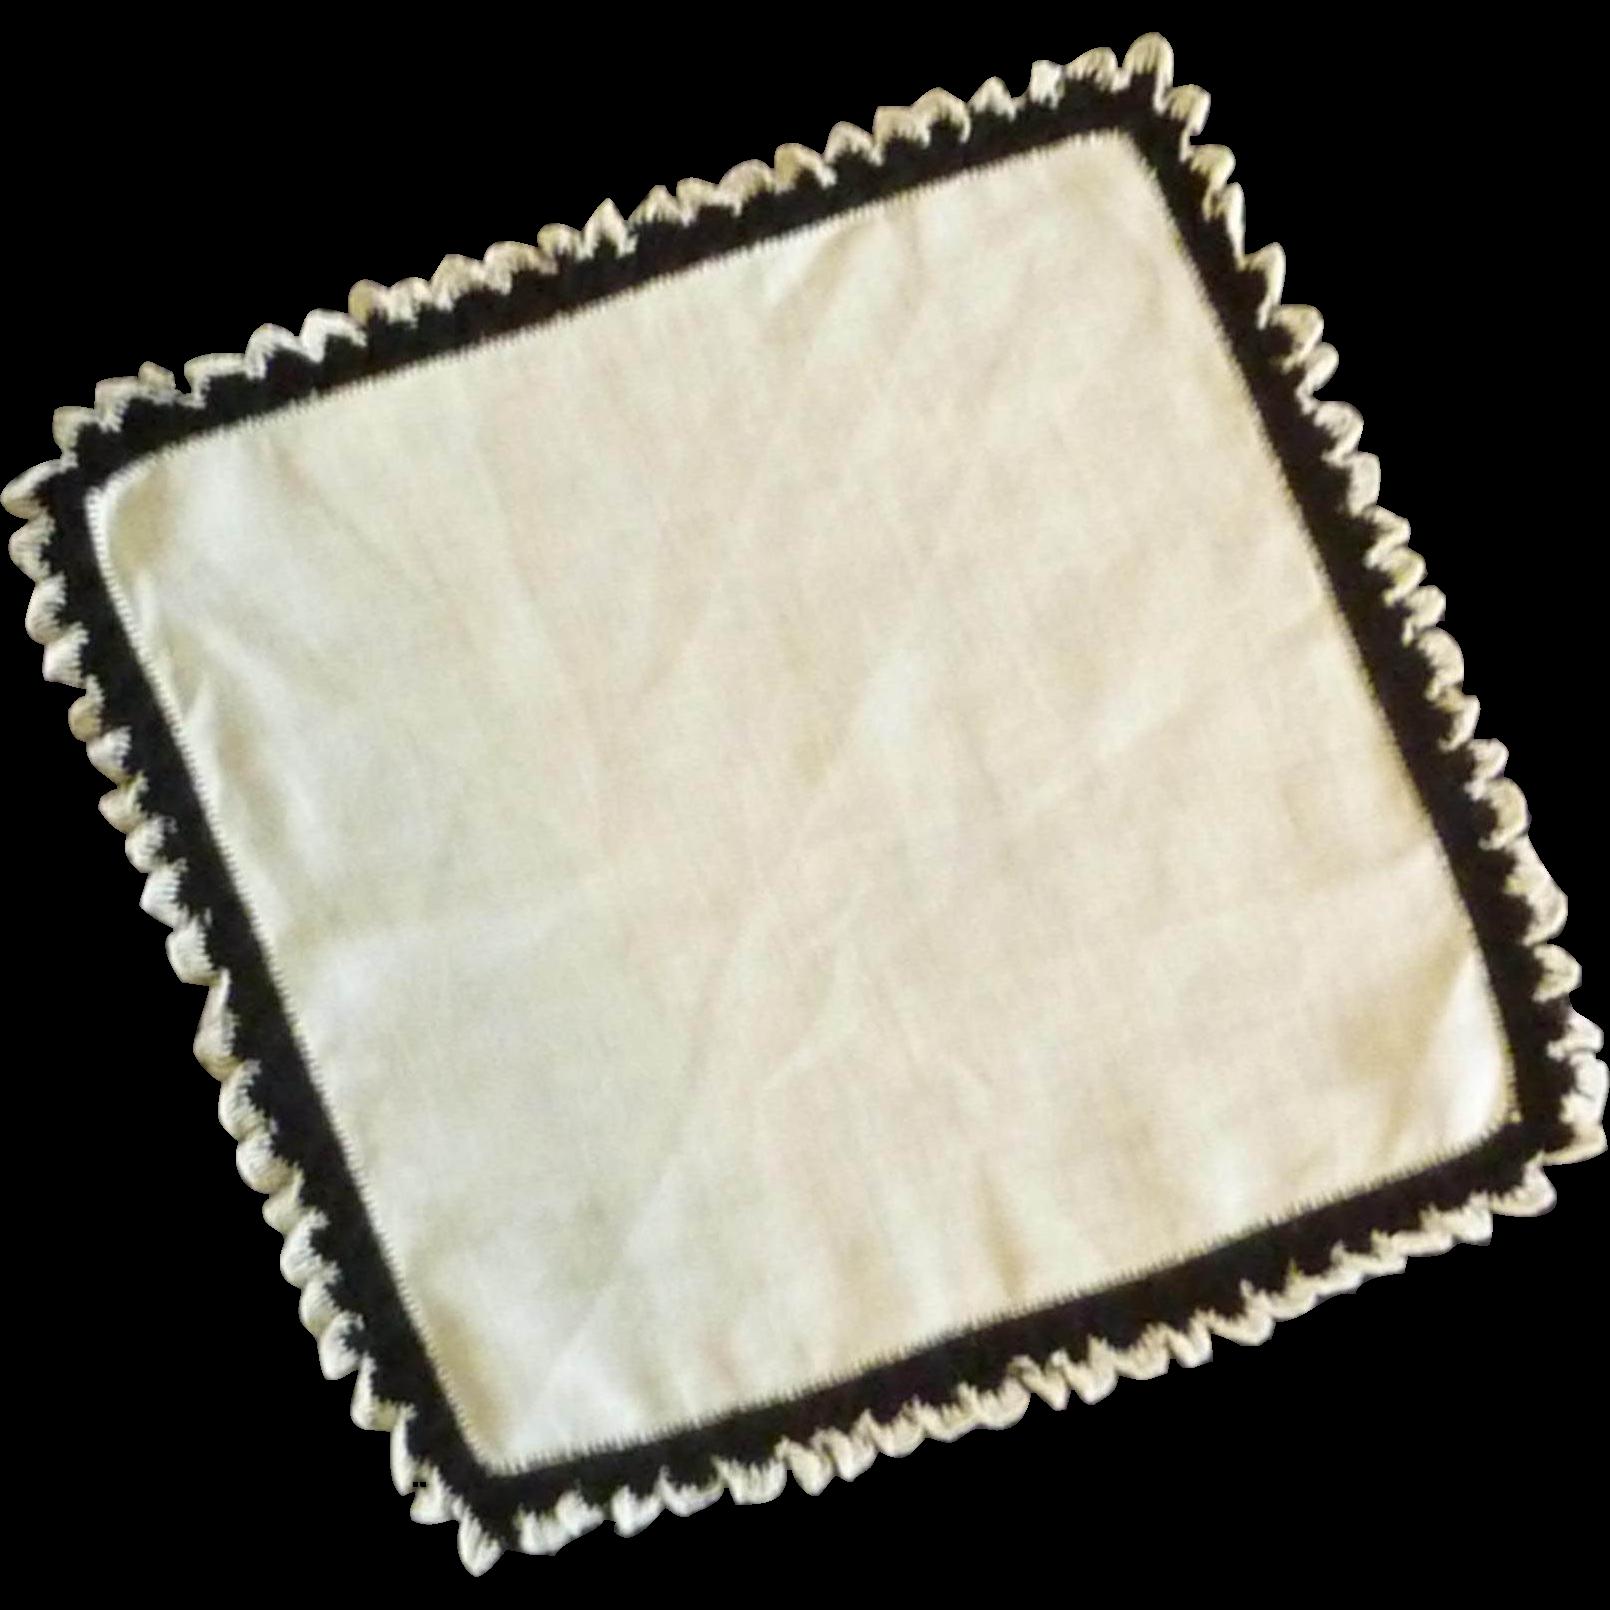 White / Black Edged Handkerchief Hankie